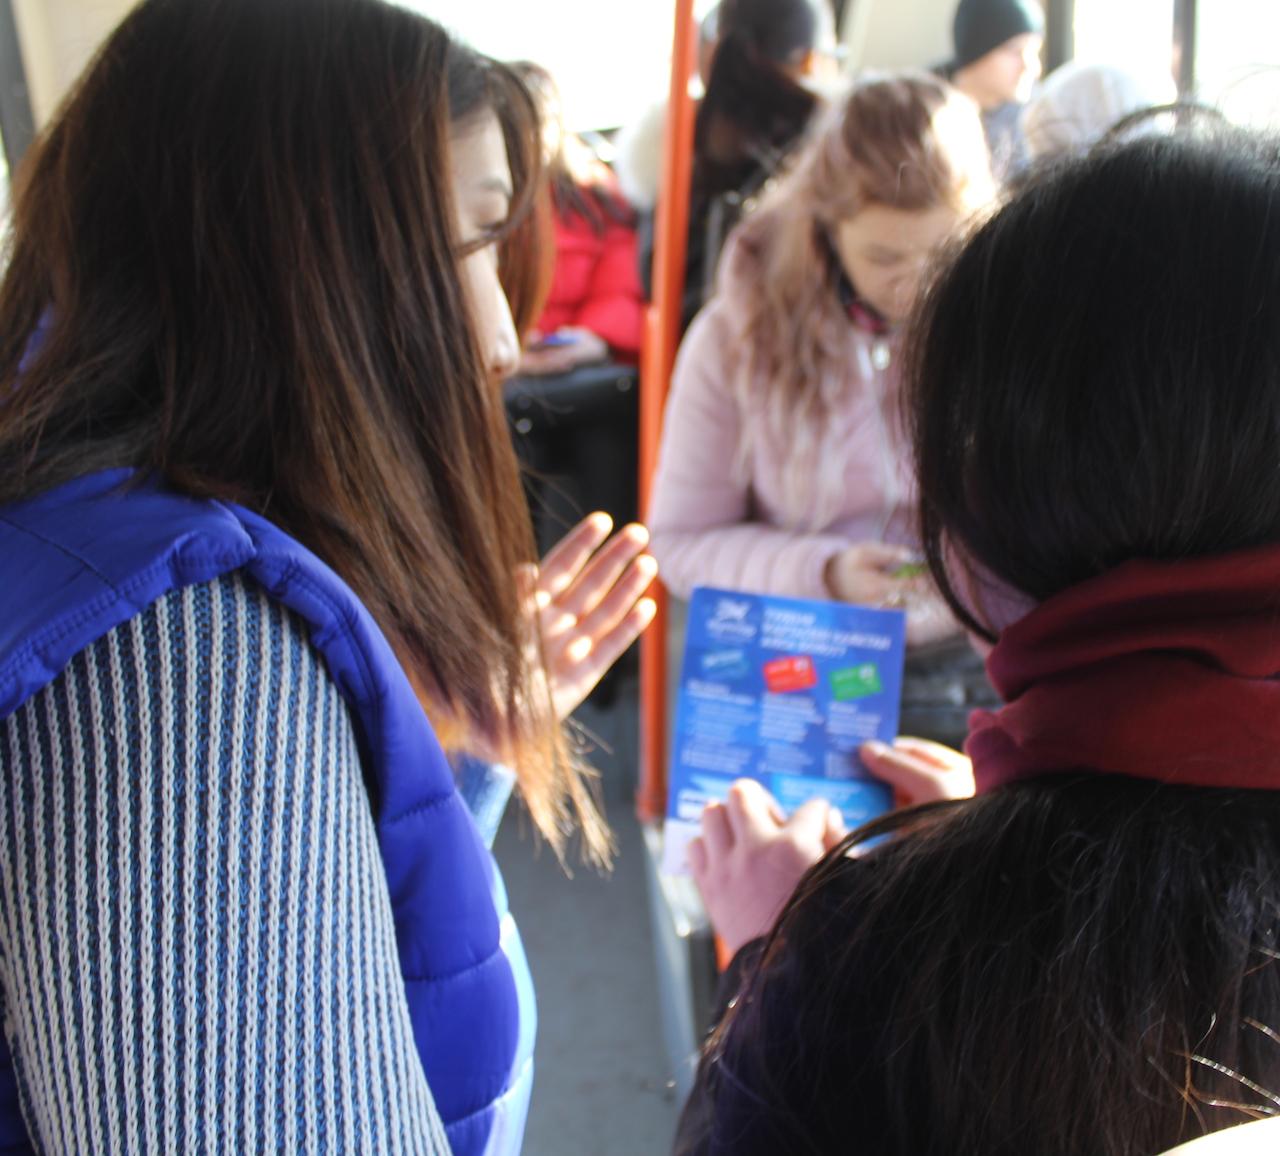 Консультанты Тулпар проводят информационную работу на маршрутах